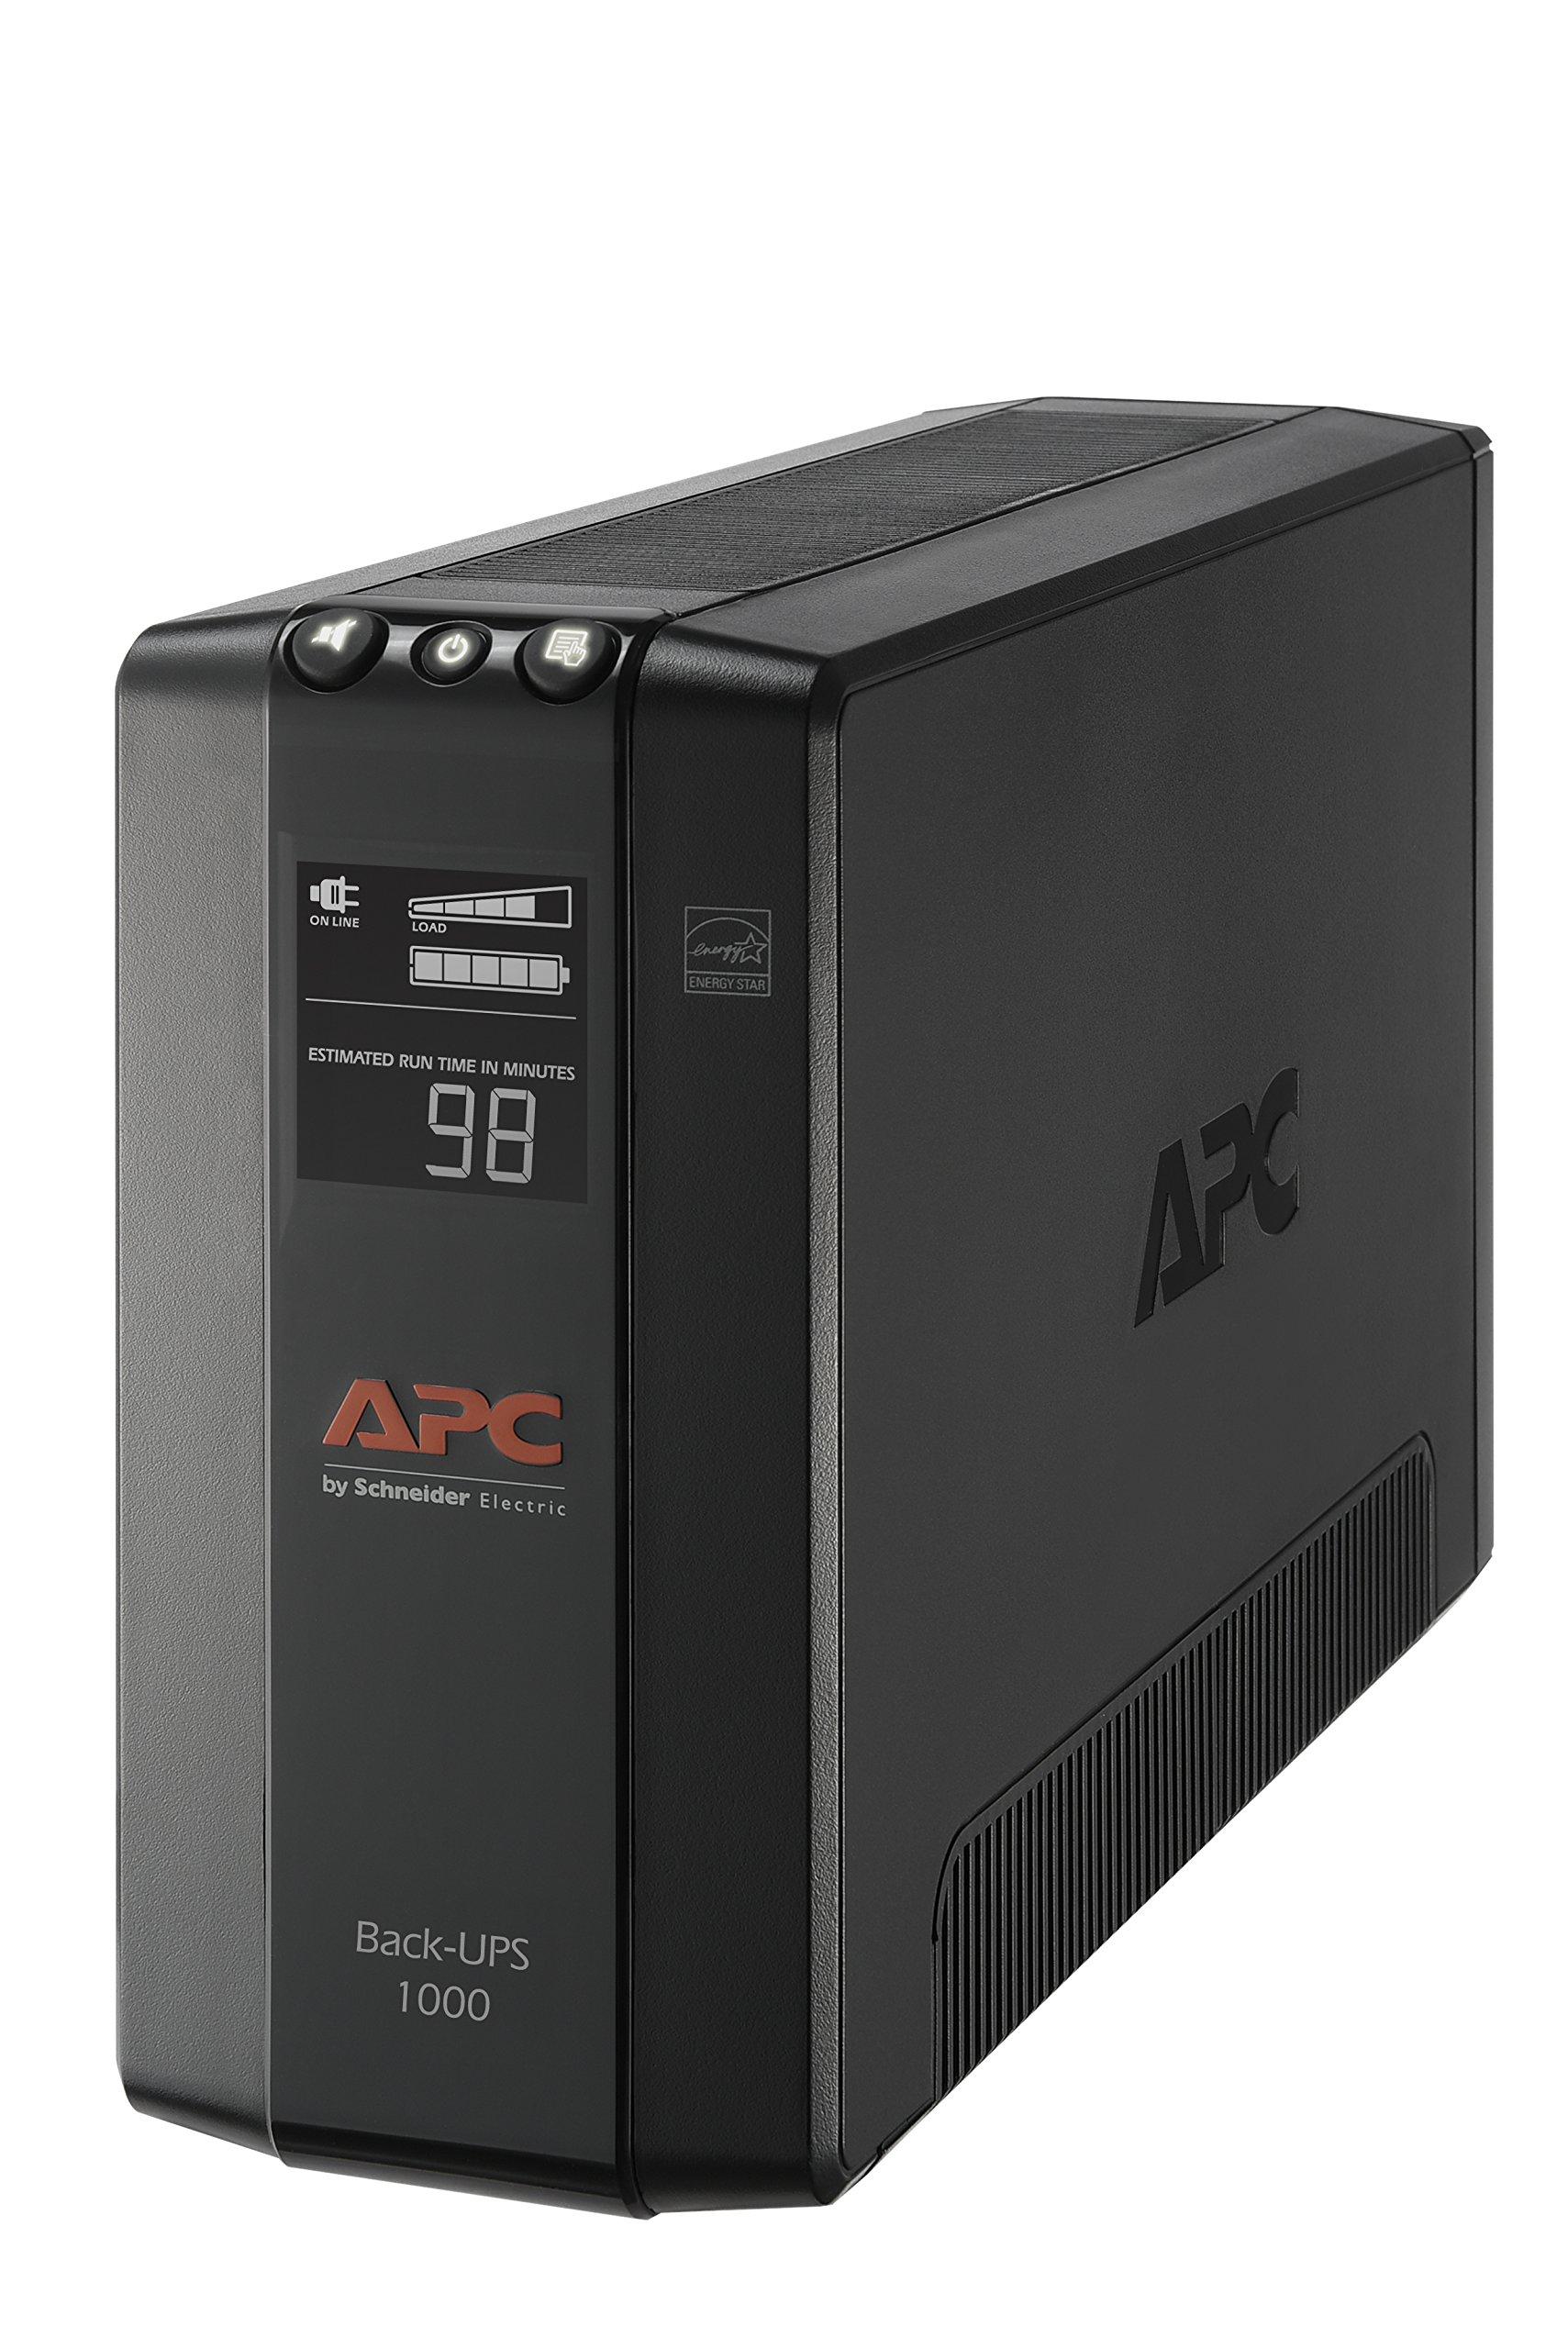 APC 1000VA Compact UPS Battery Backup & Surge Protector, Back-UPS Pro (BX1000M)